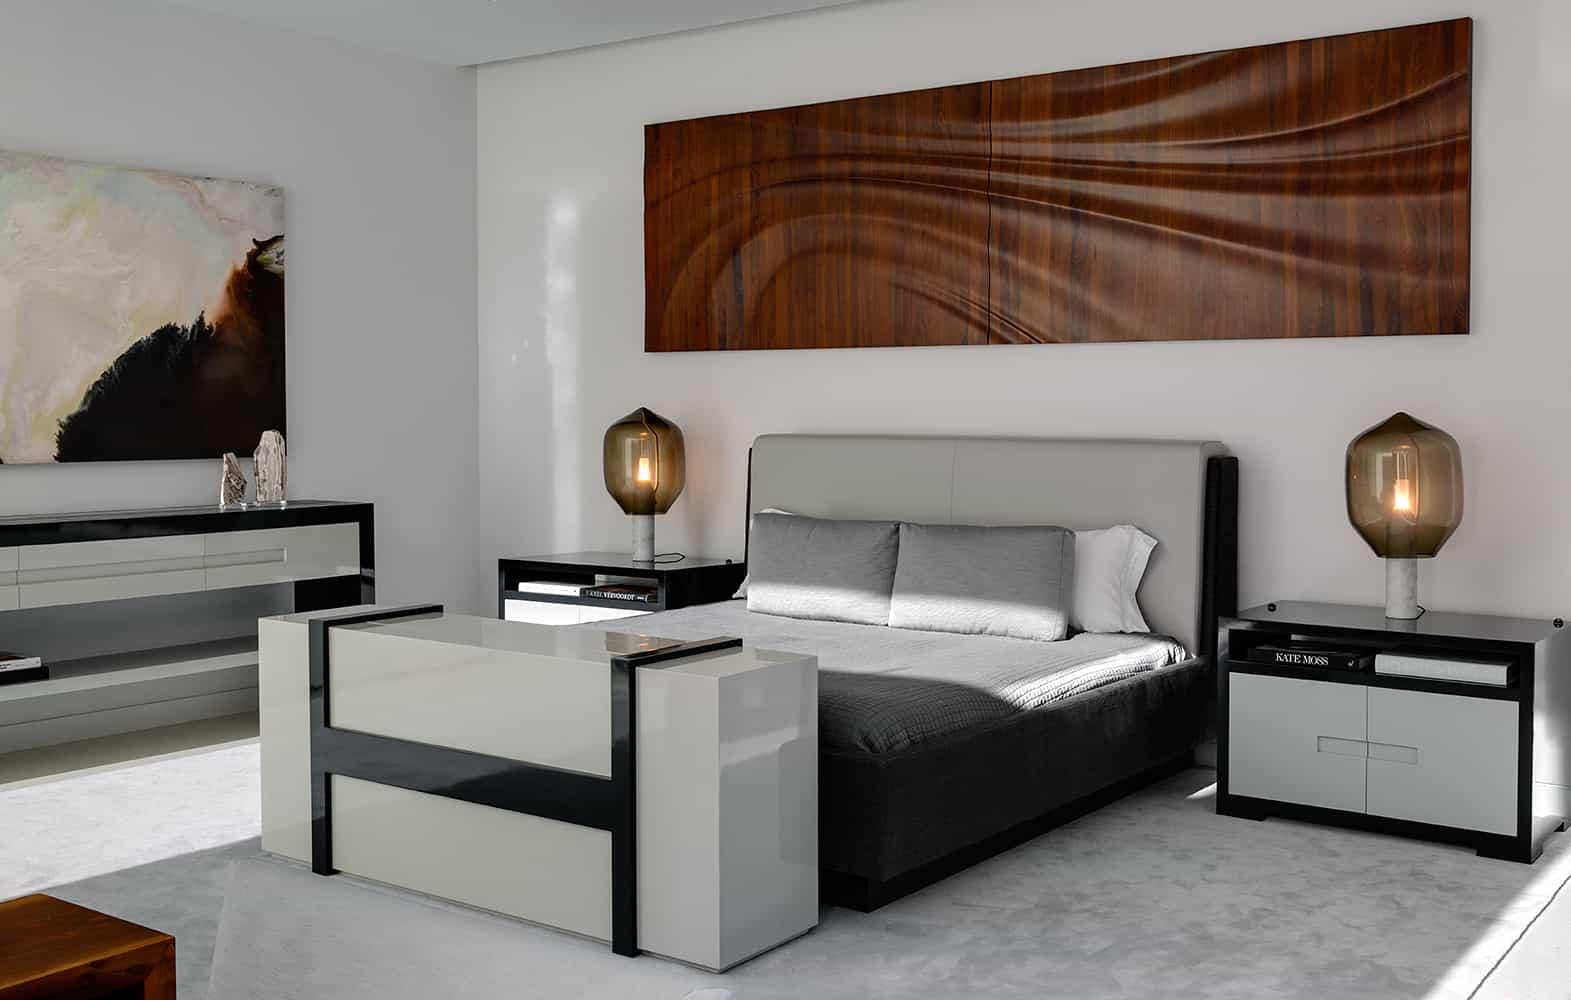 Modern-Home-Renovation-Belzberg Architects-11-1 Kindesign